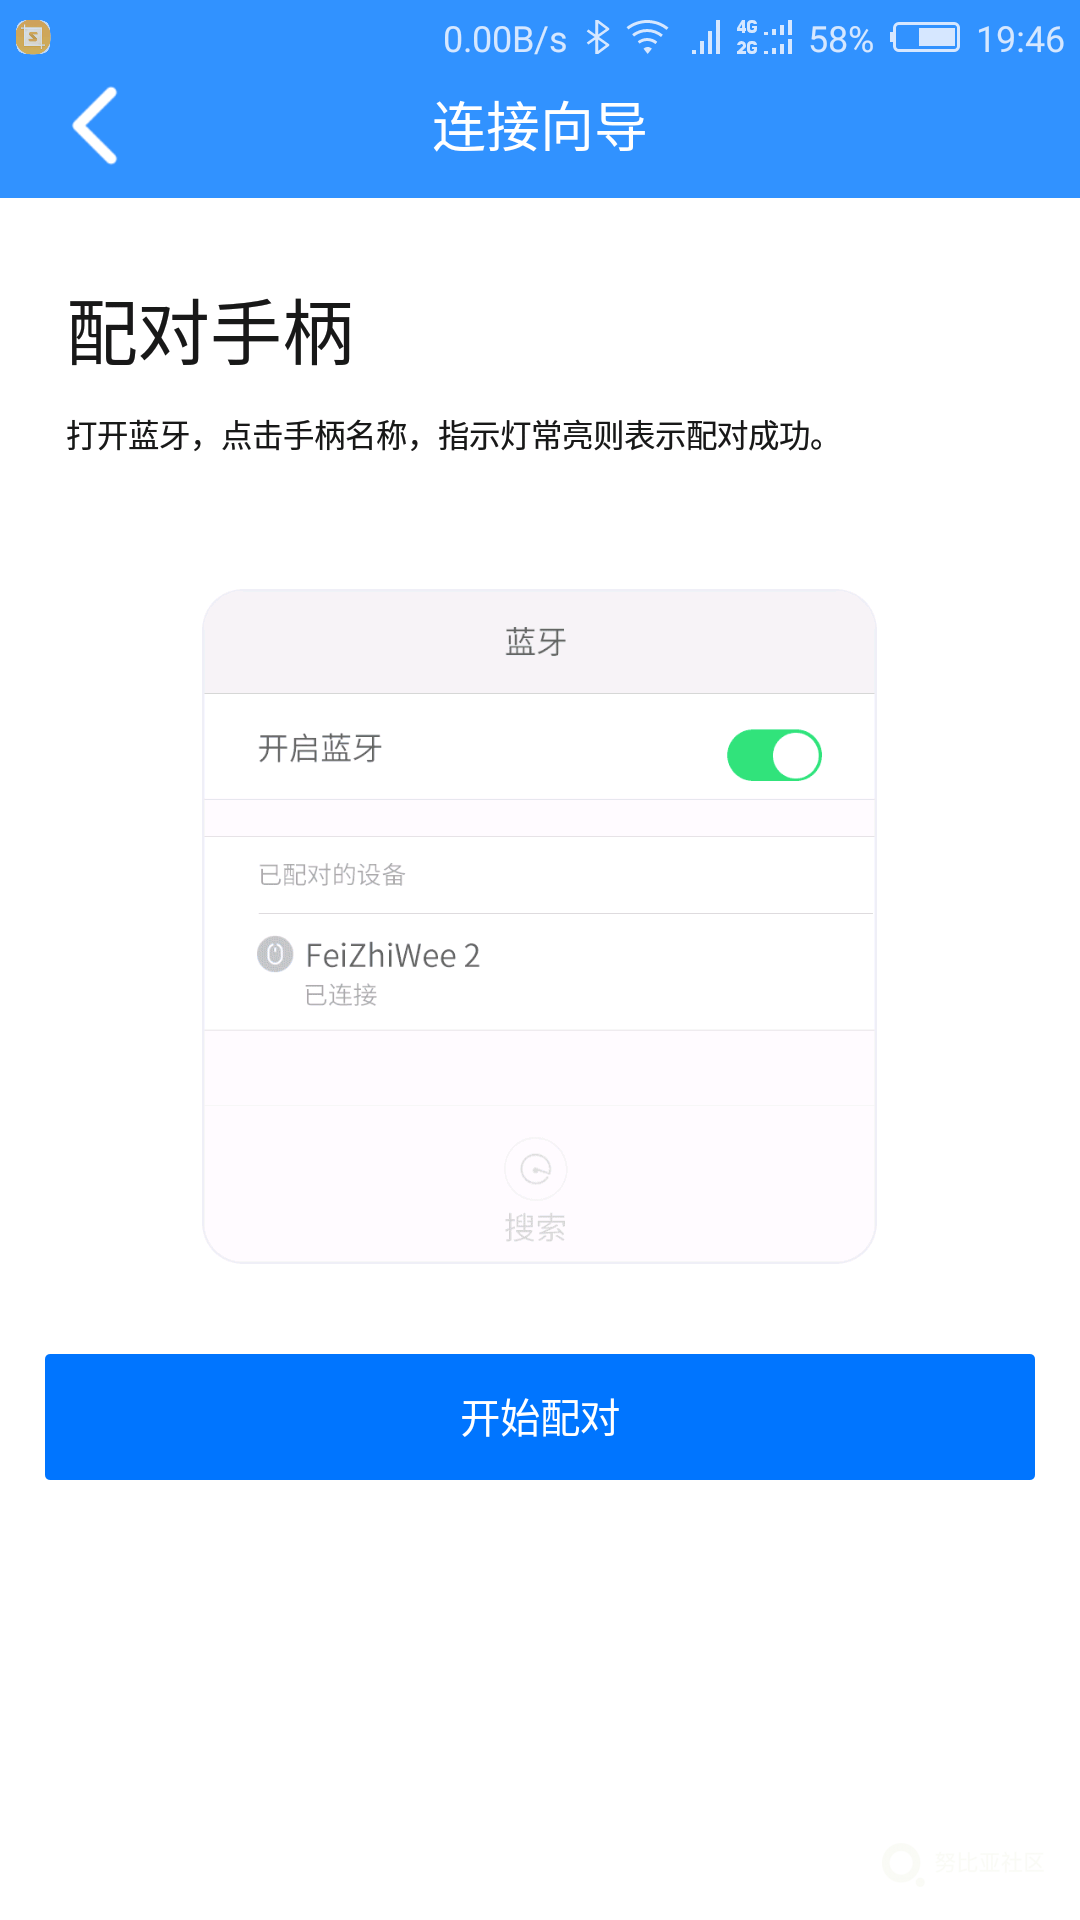 Screenshot_2018-06-15-19-46-09.png